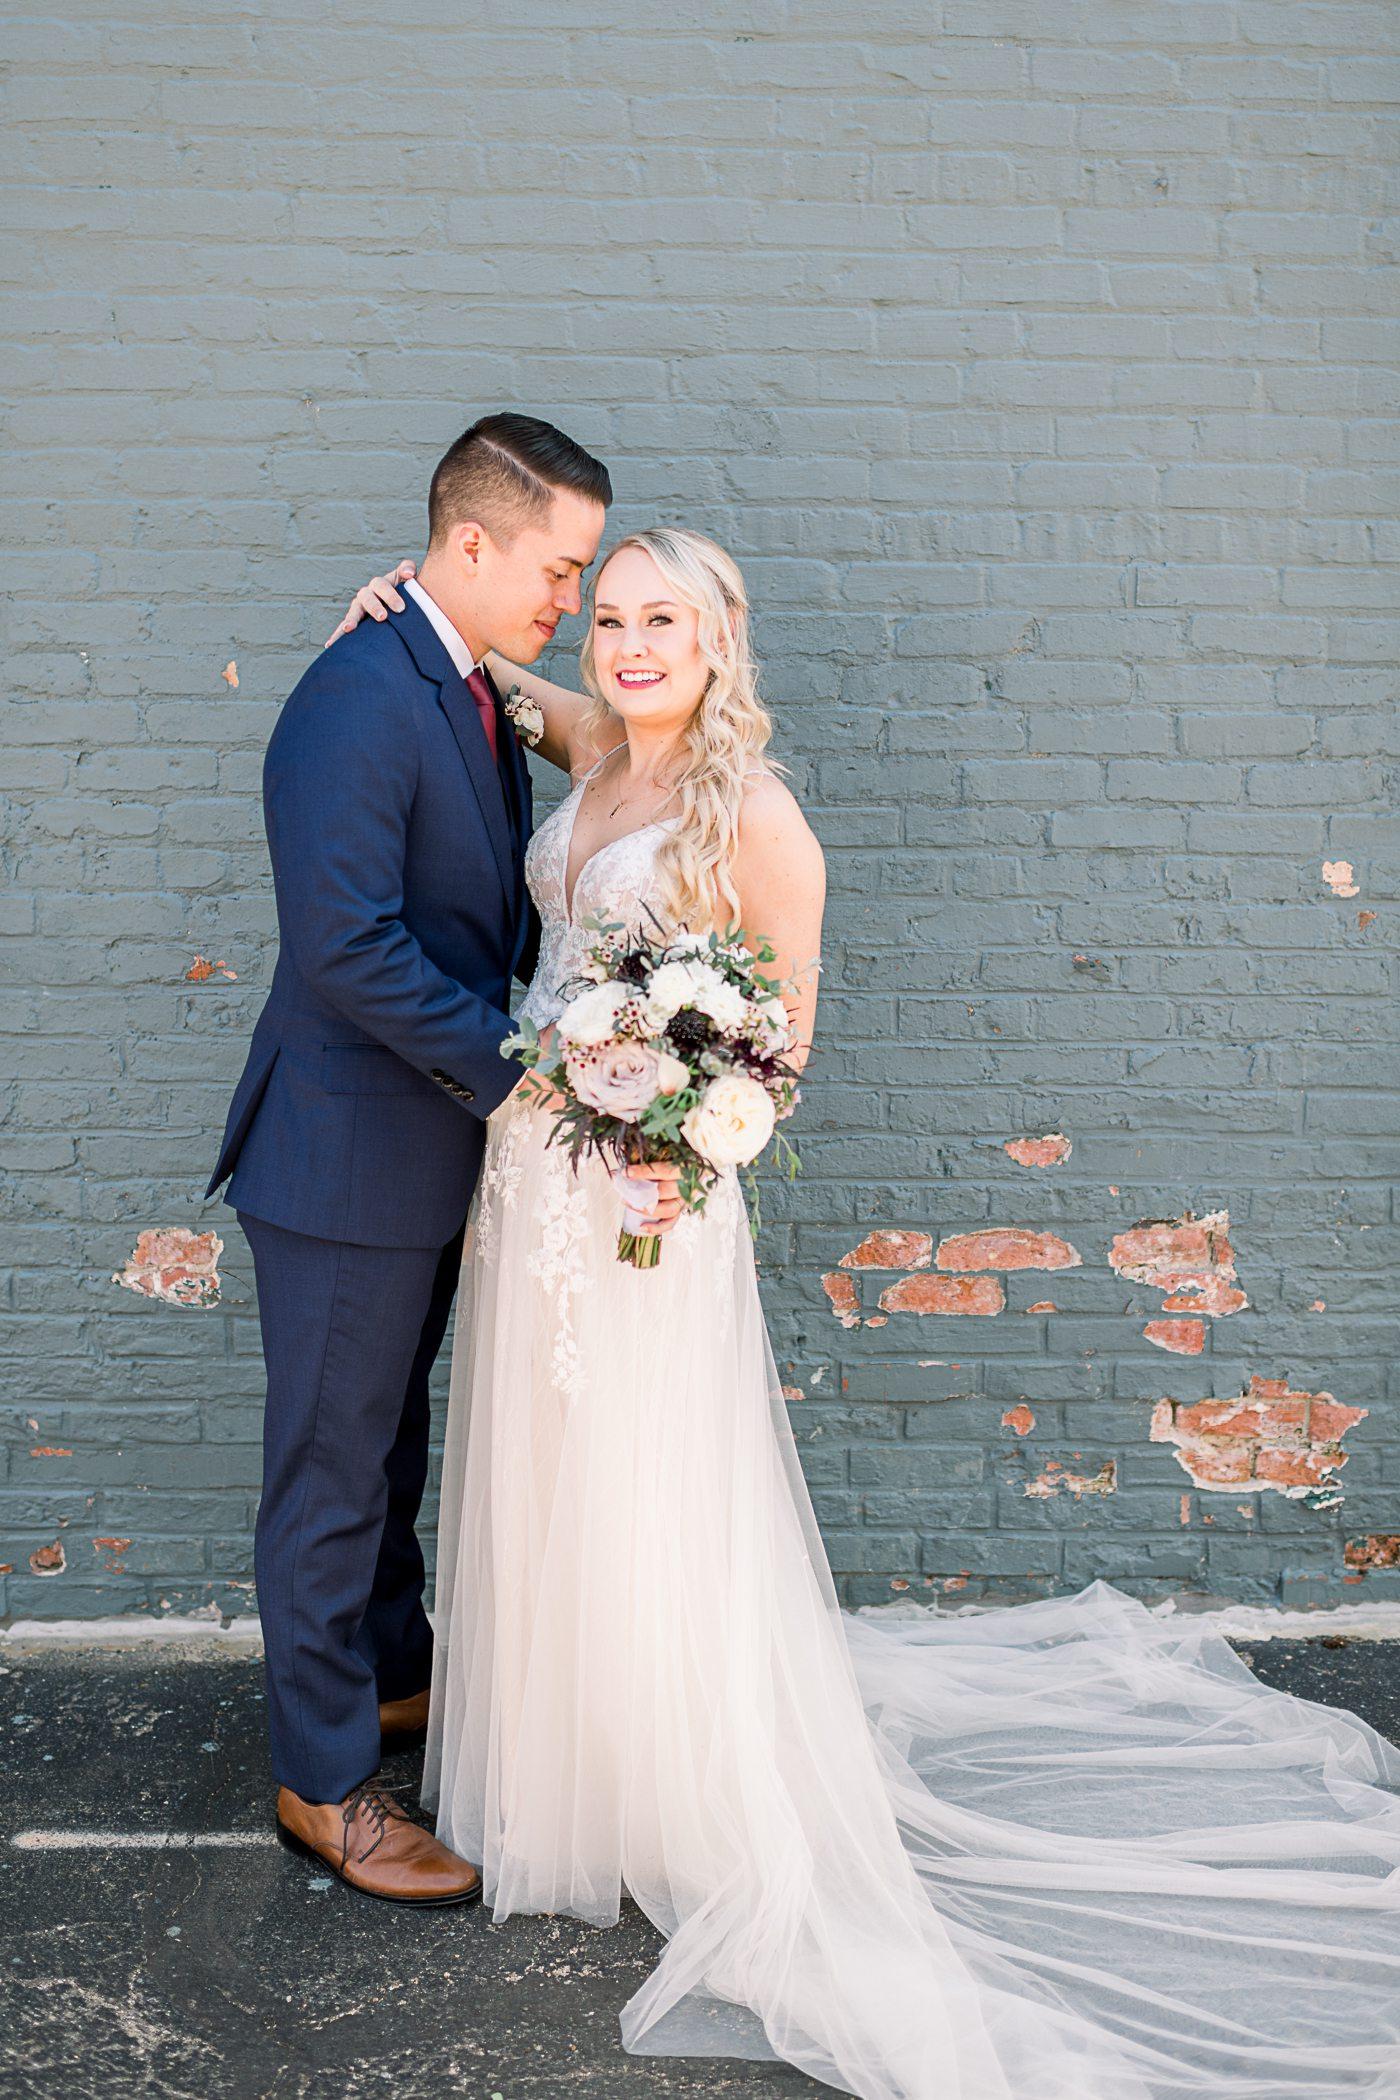 Burlington, WI Mercantile Hall Wedding Photographers